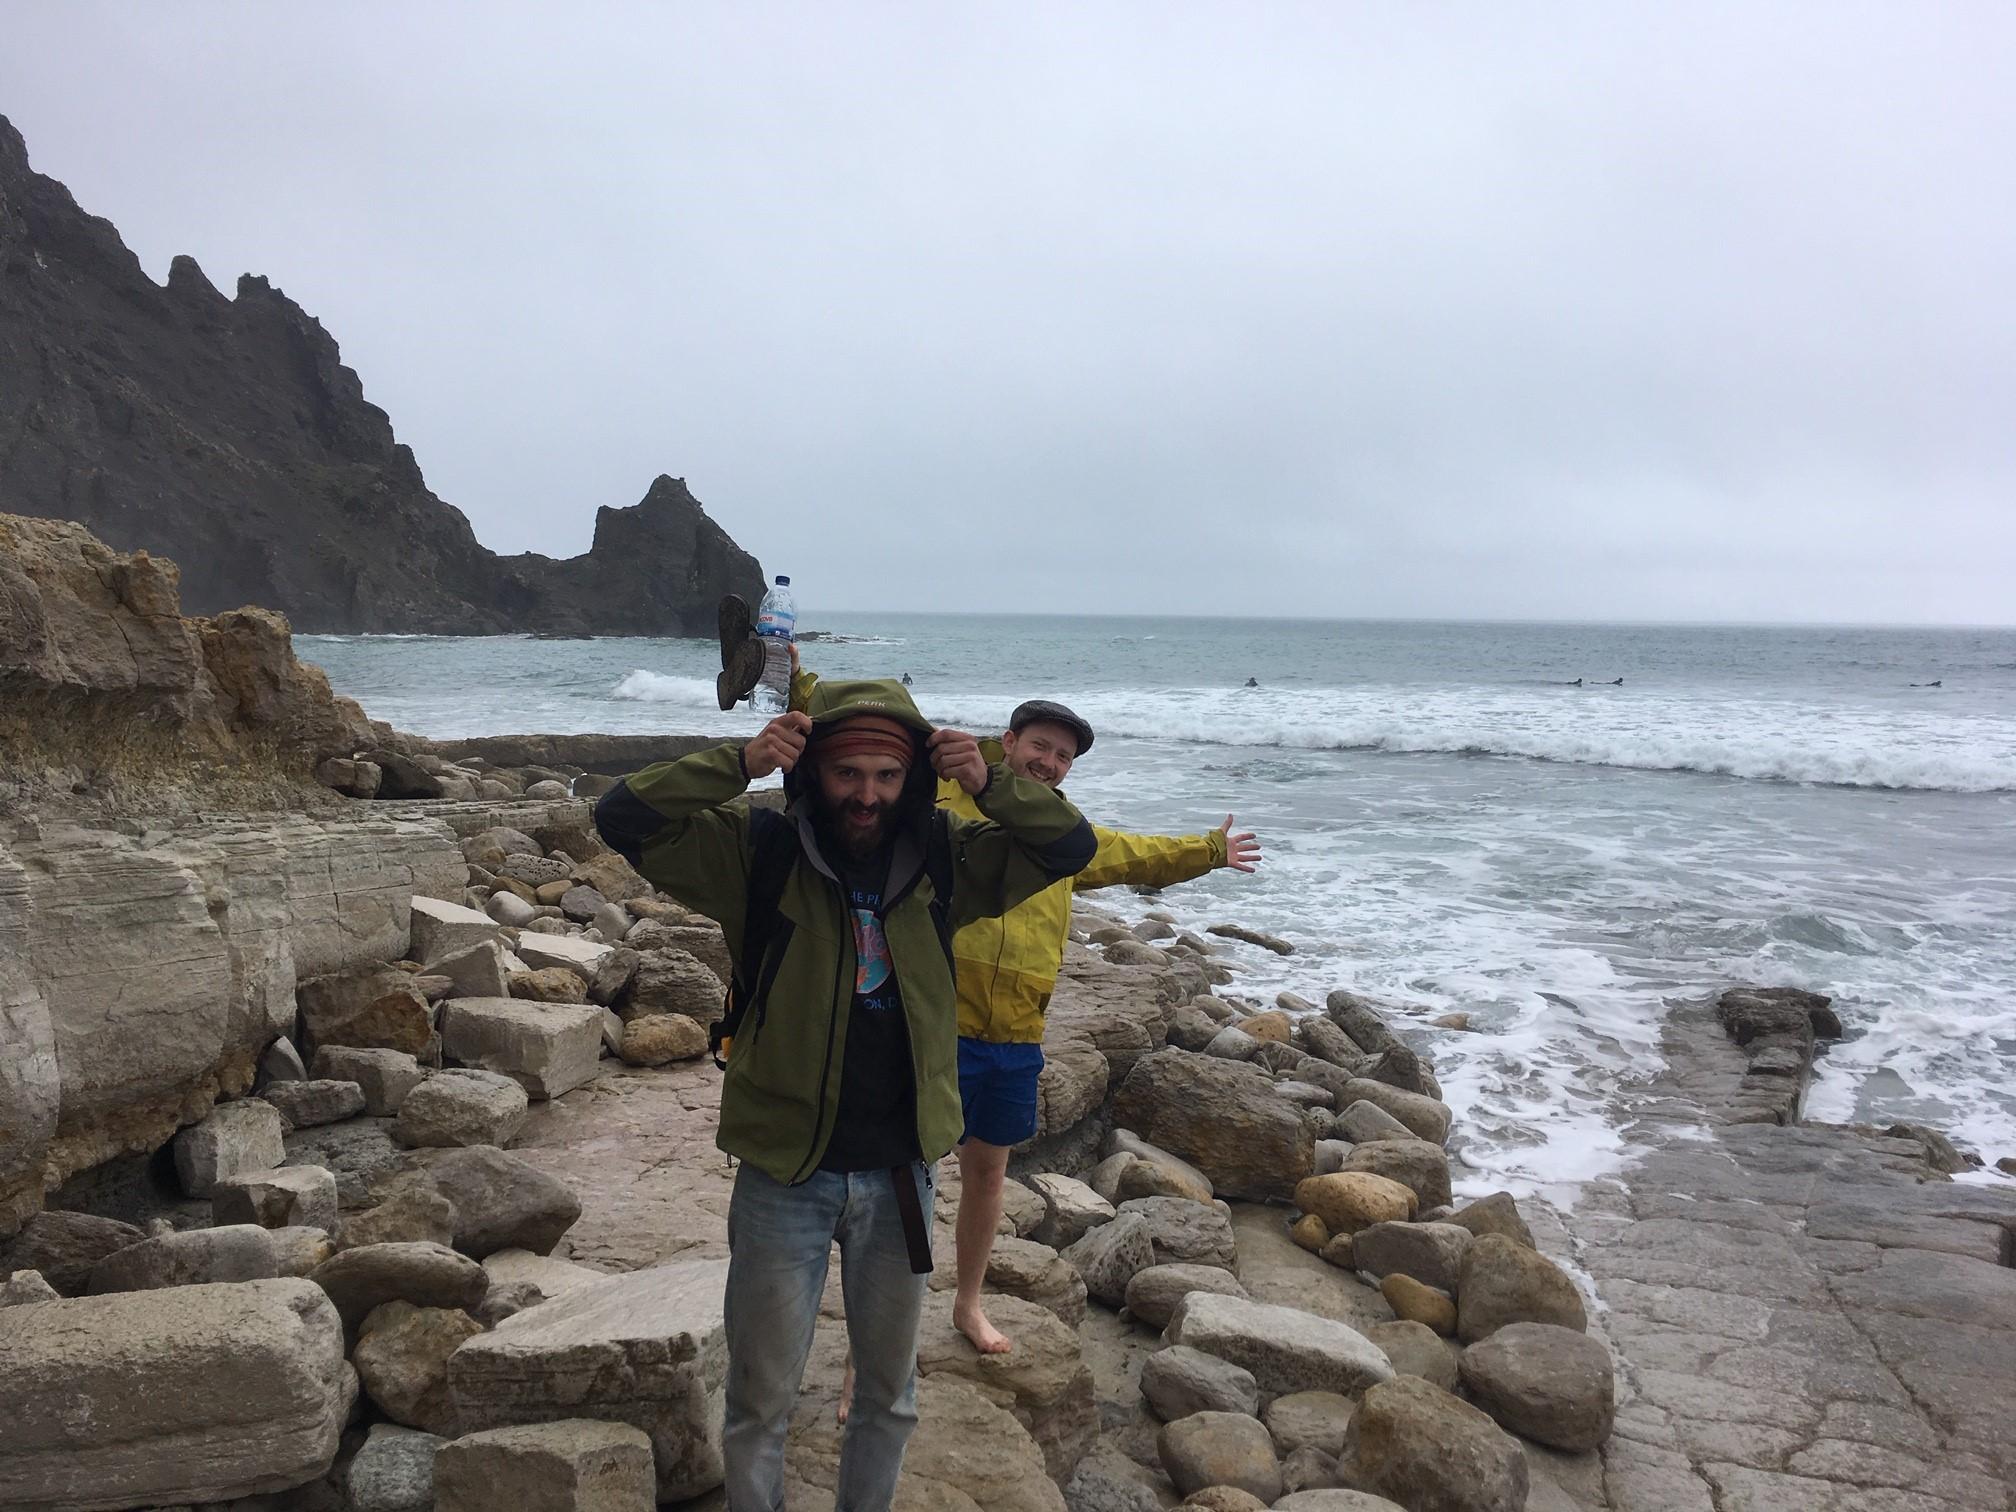 luz surf rain surfboys on the rocks